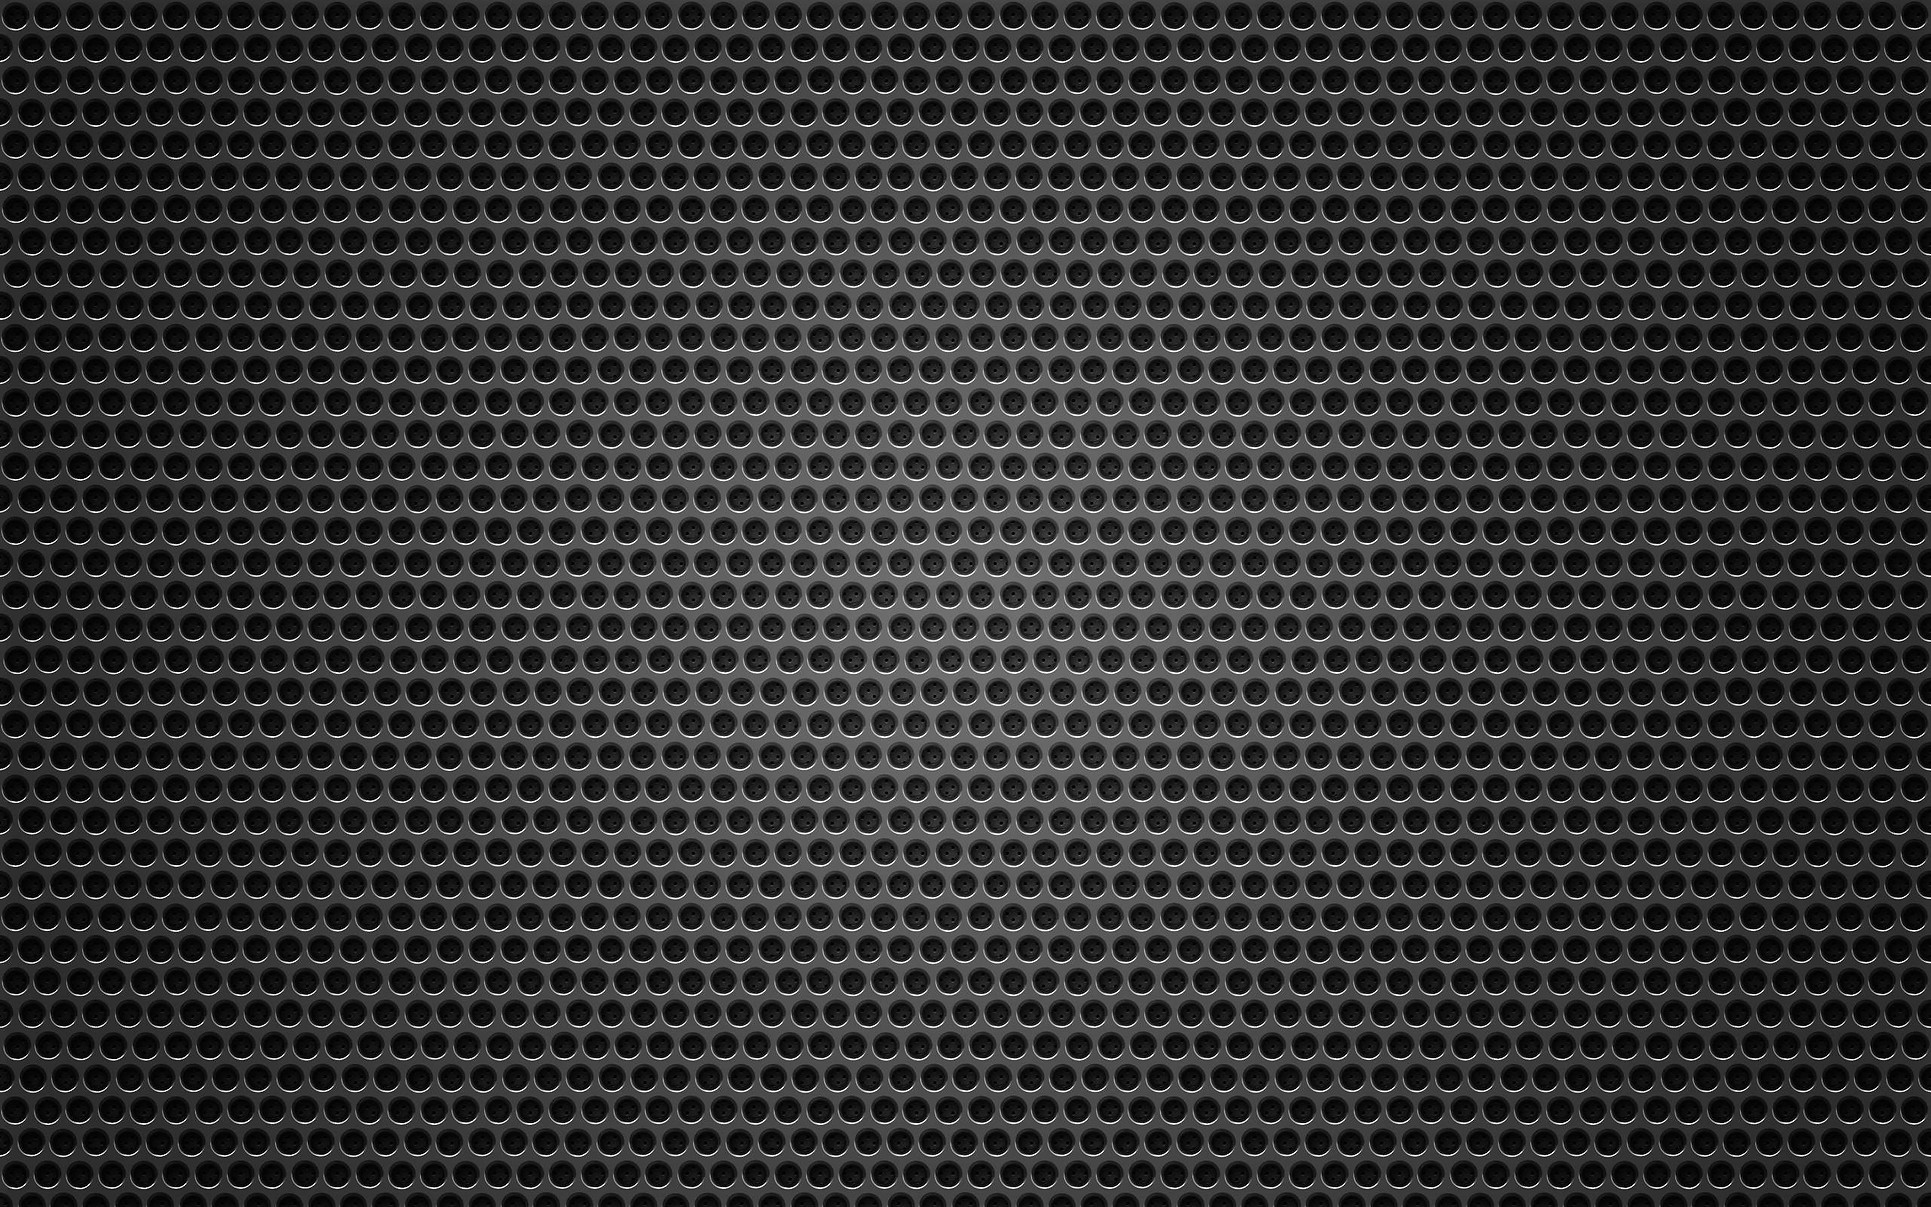 Big Carbon.jpg